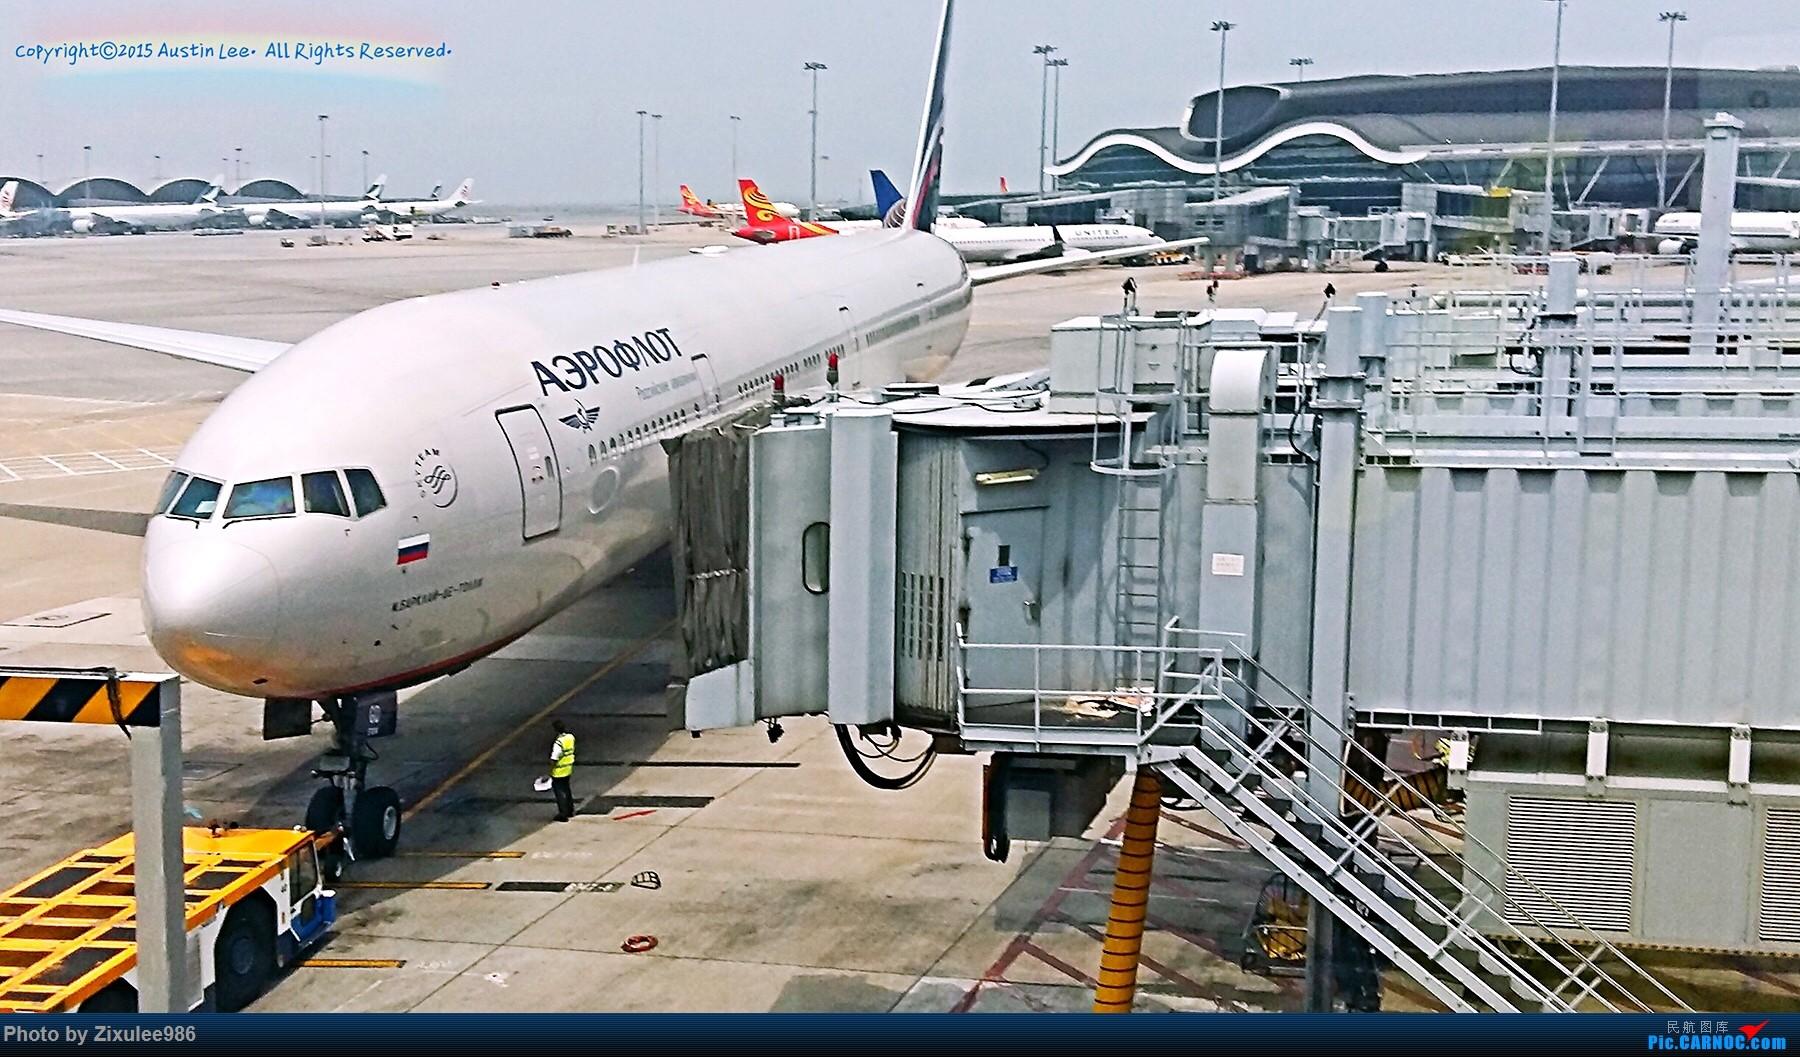 Re:[原创]三年旅途的随拍精选~持续不定时update BOEING 777-3M0(ER) VP-BGD 中国香港国际机场